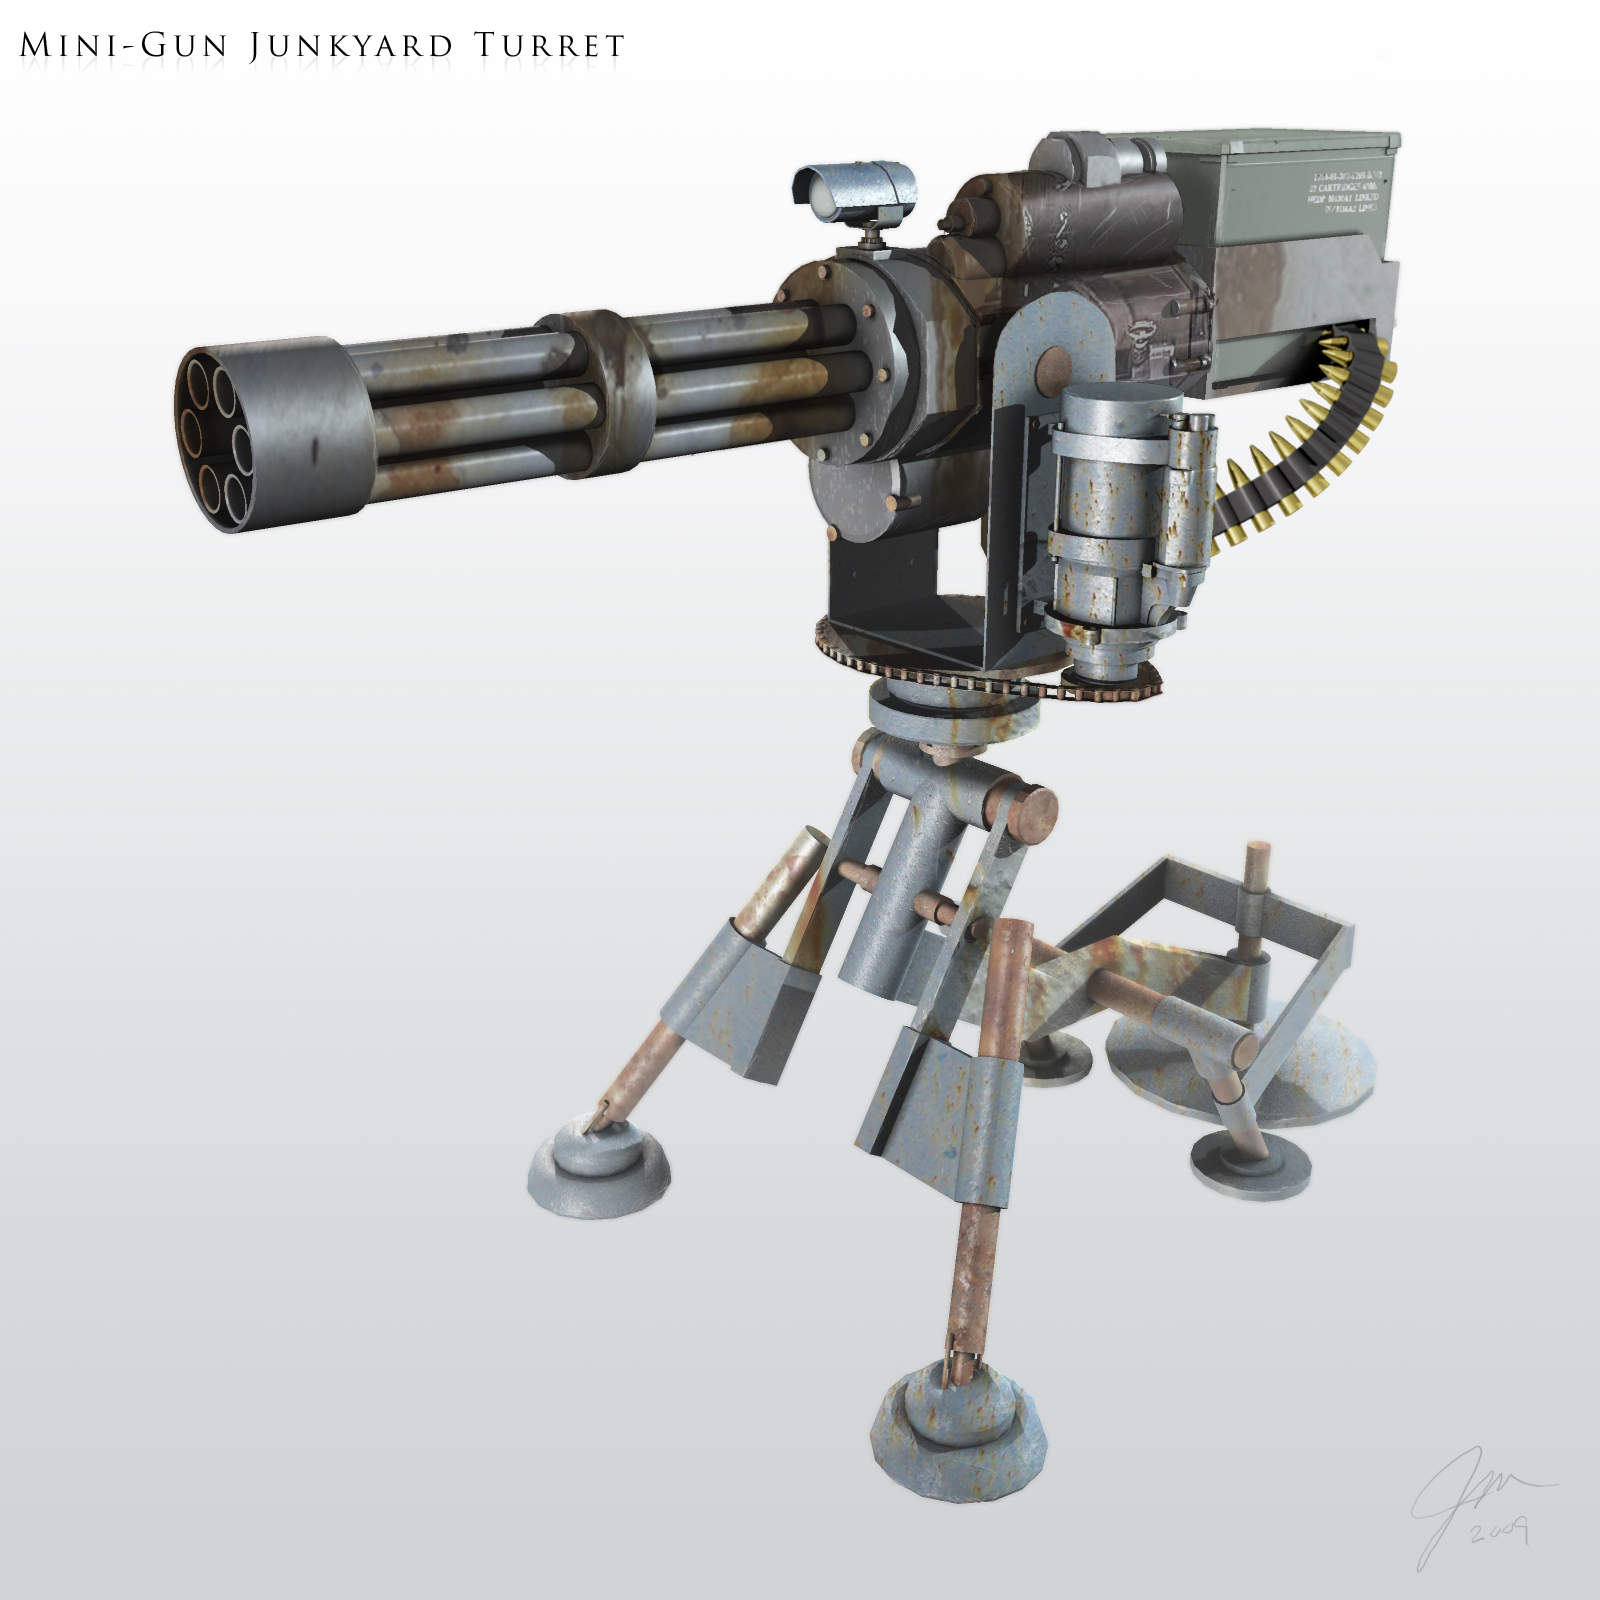 IMG:http://fc06.deviantart.net/fs49/f/2009/170/a/d/minigun_junkyard_turret_by_Jeff_Meyer.jpg